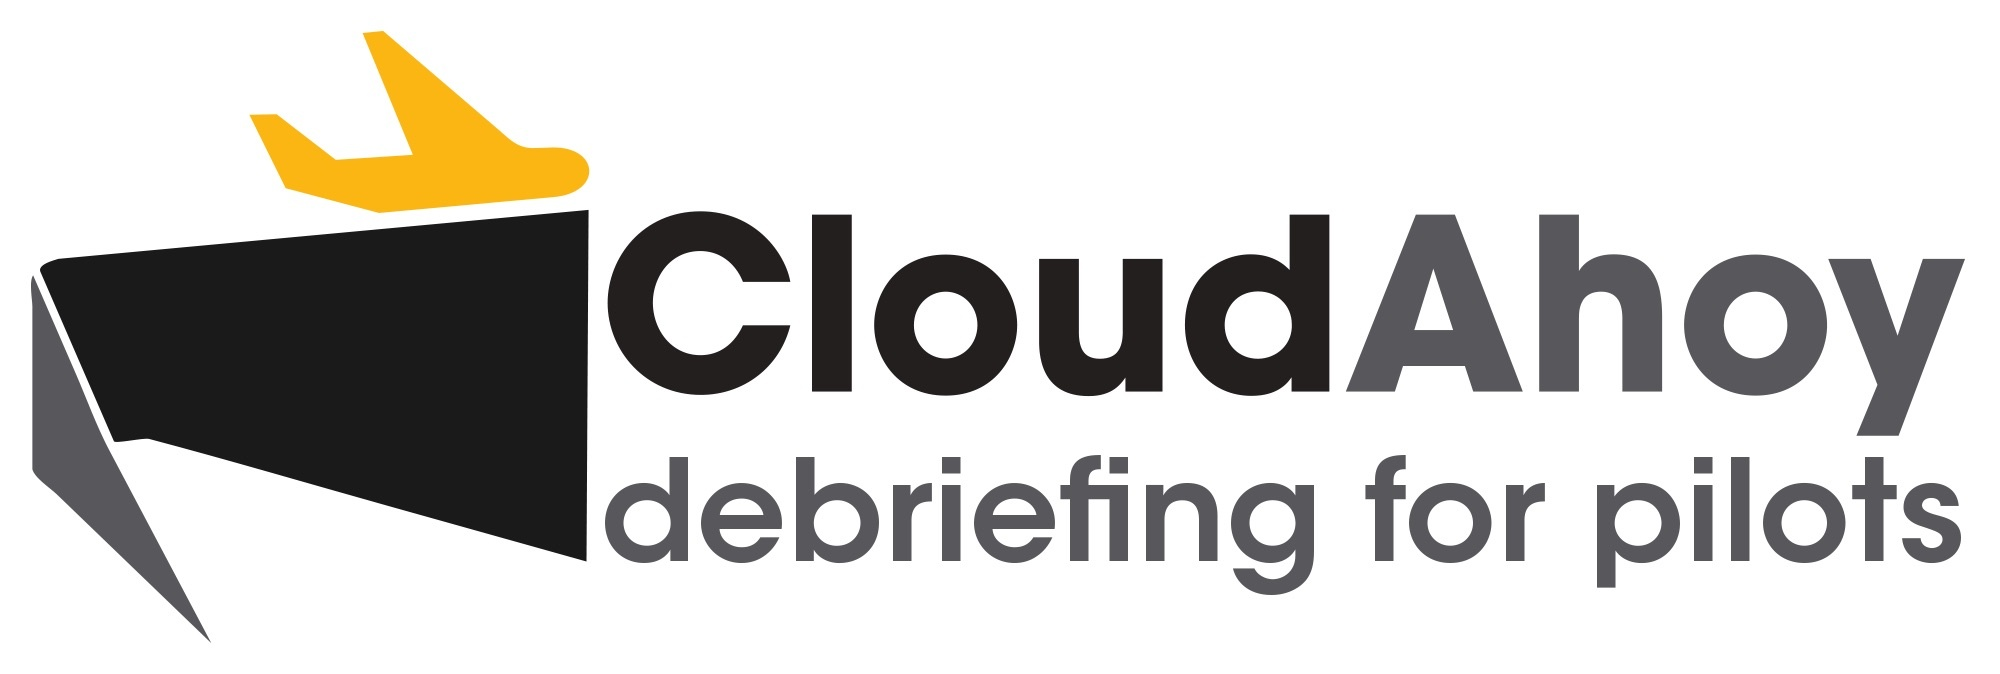 cloudahoy logo 2.jpg